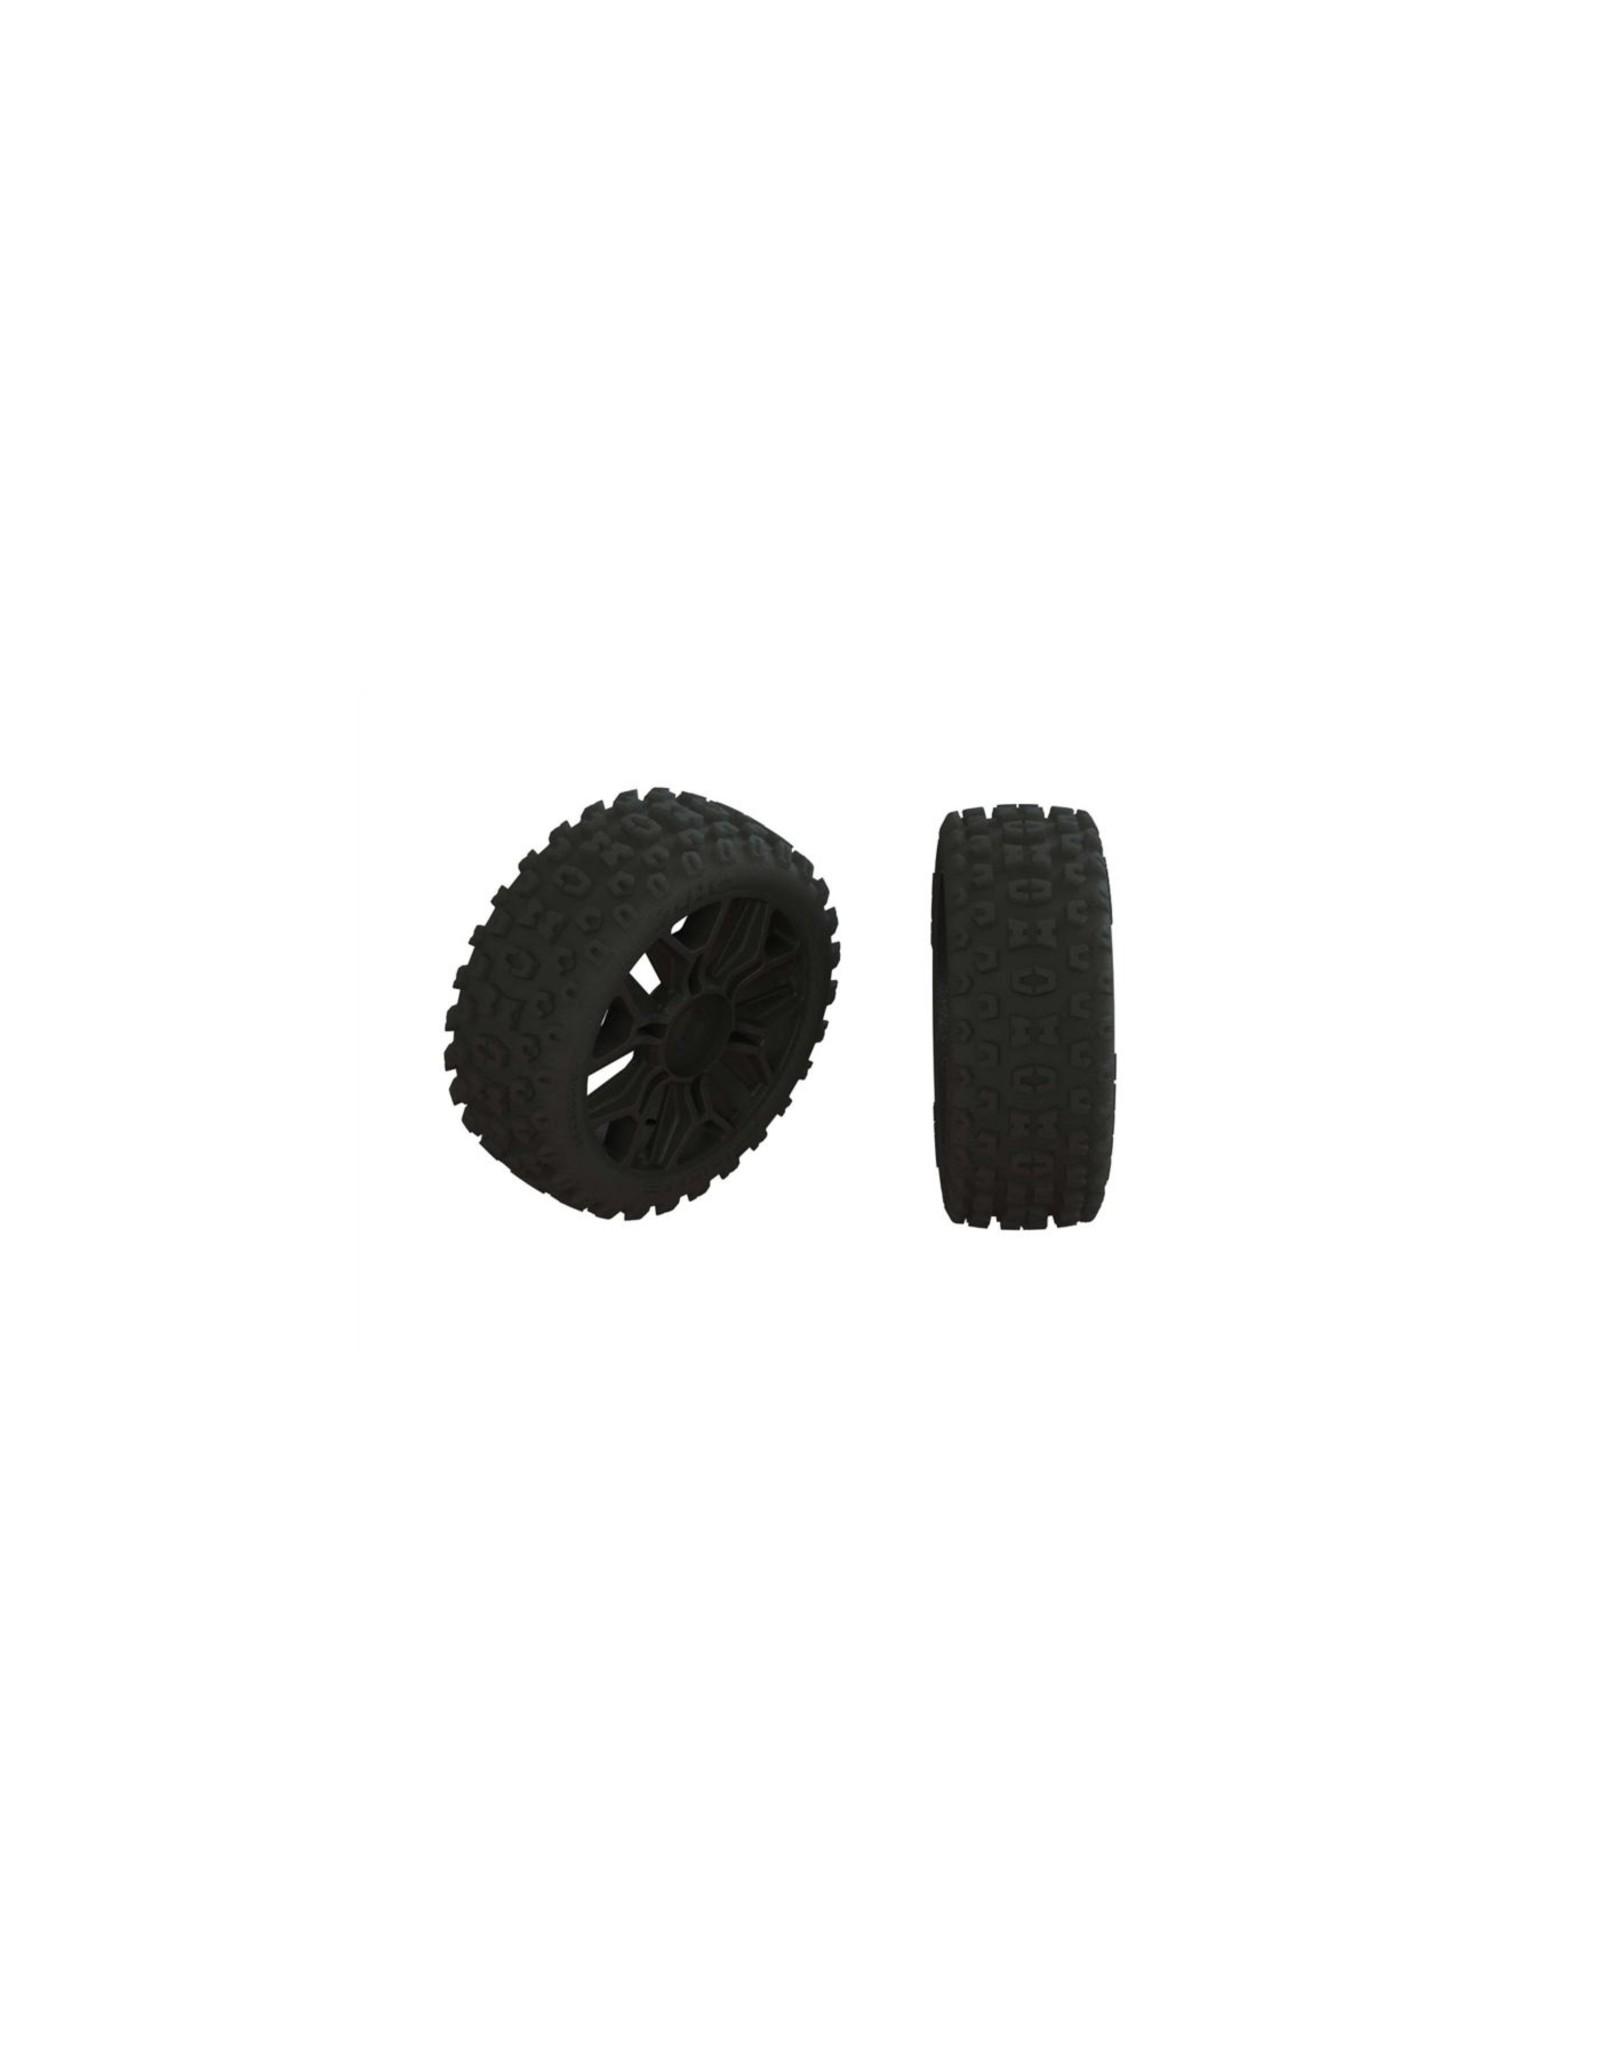 Arrma AR550057 - 1/8 2HO Front/Rear 3.3 Pre-Mounted Tires, 17mm Hex - Black